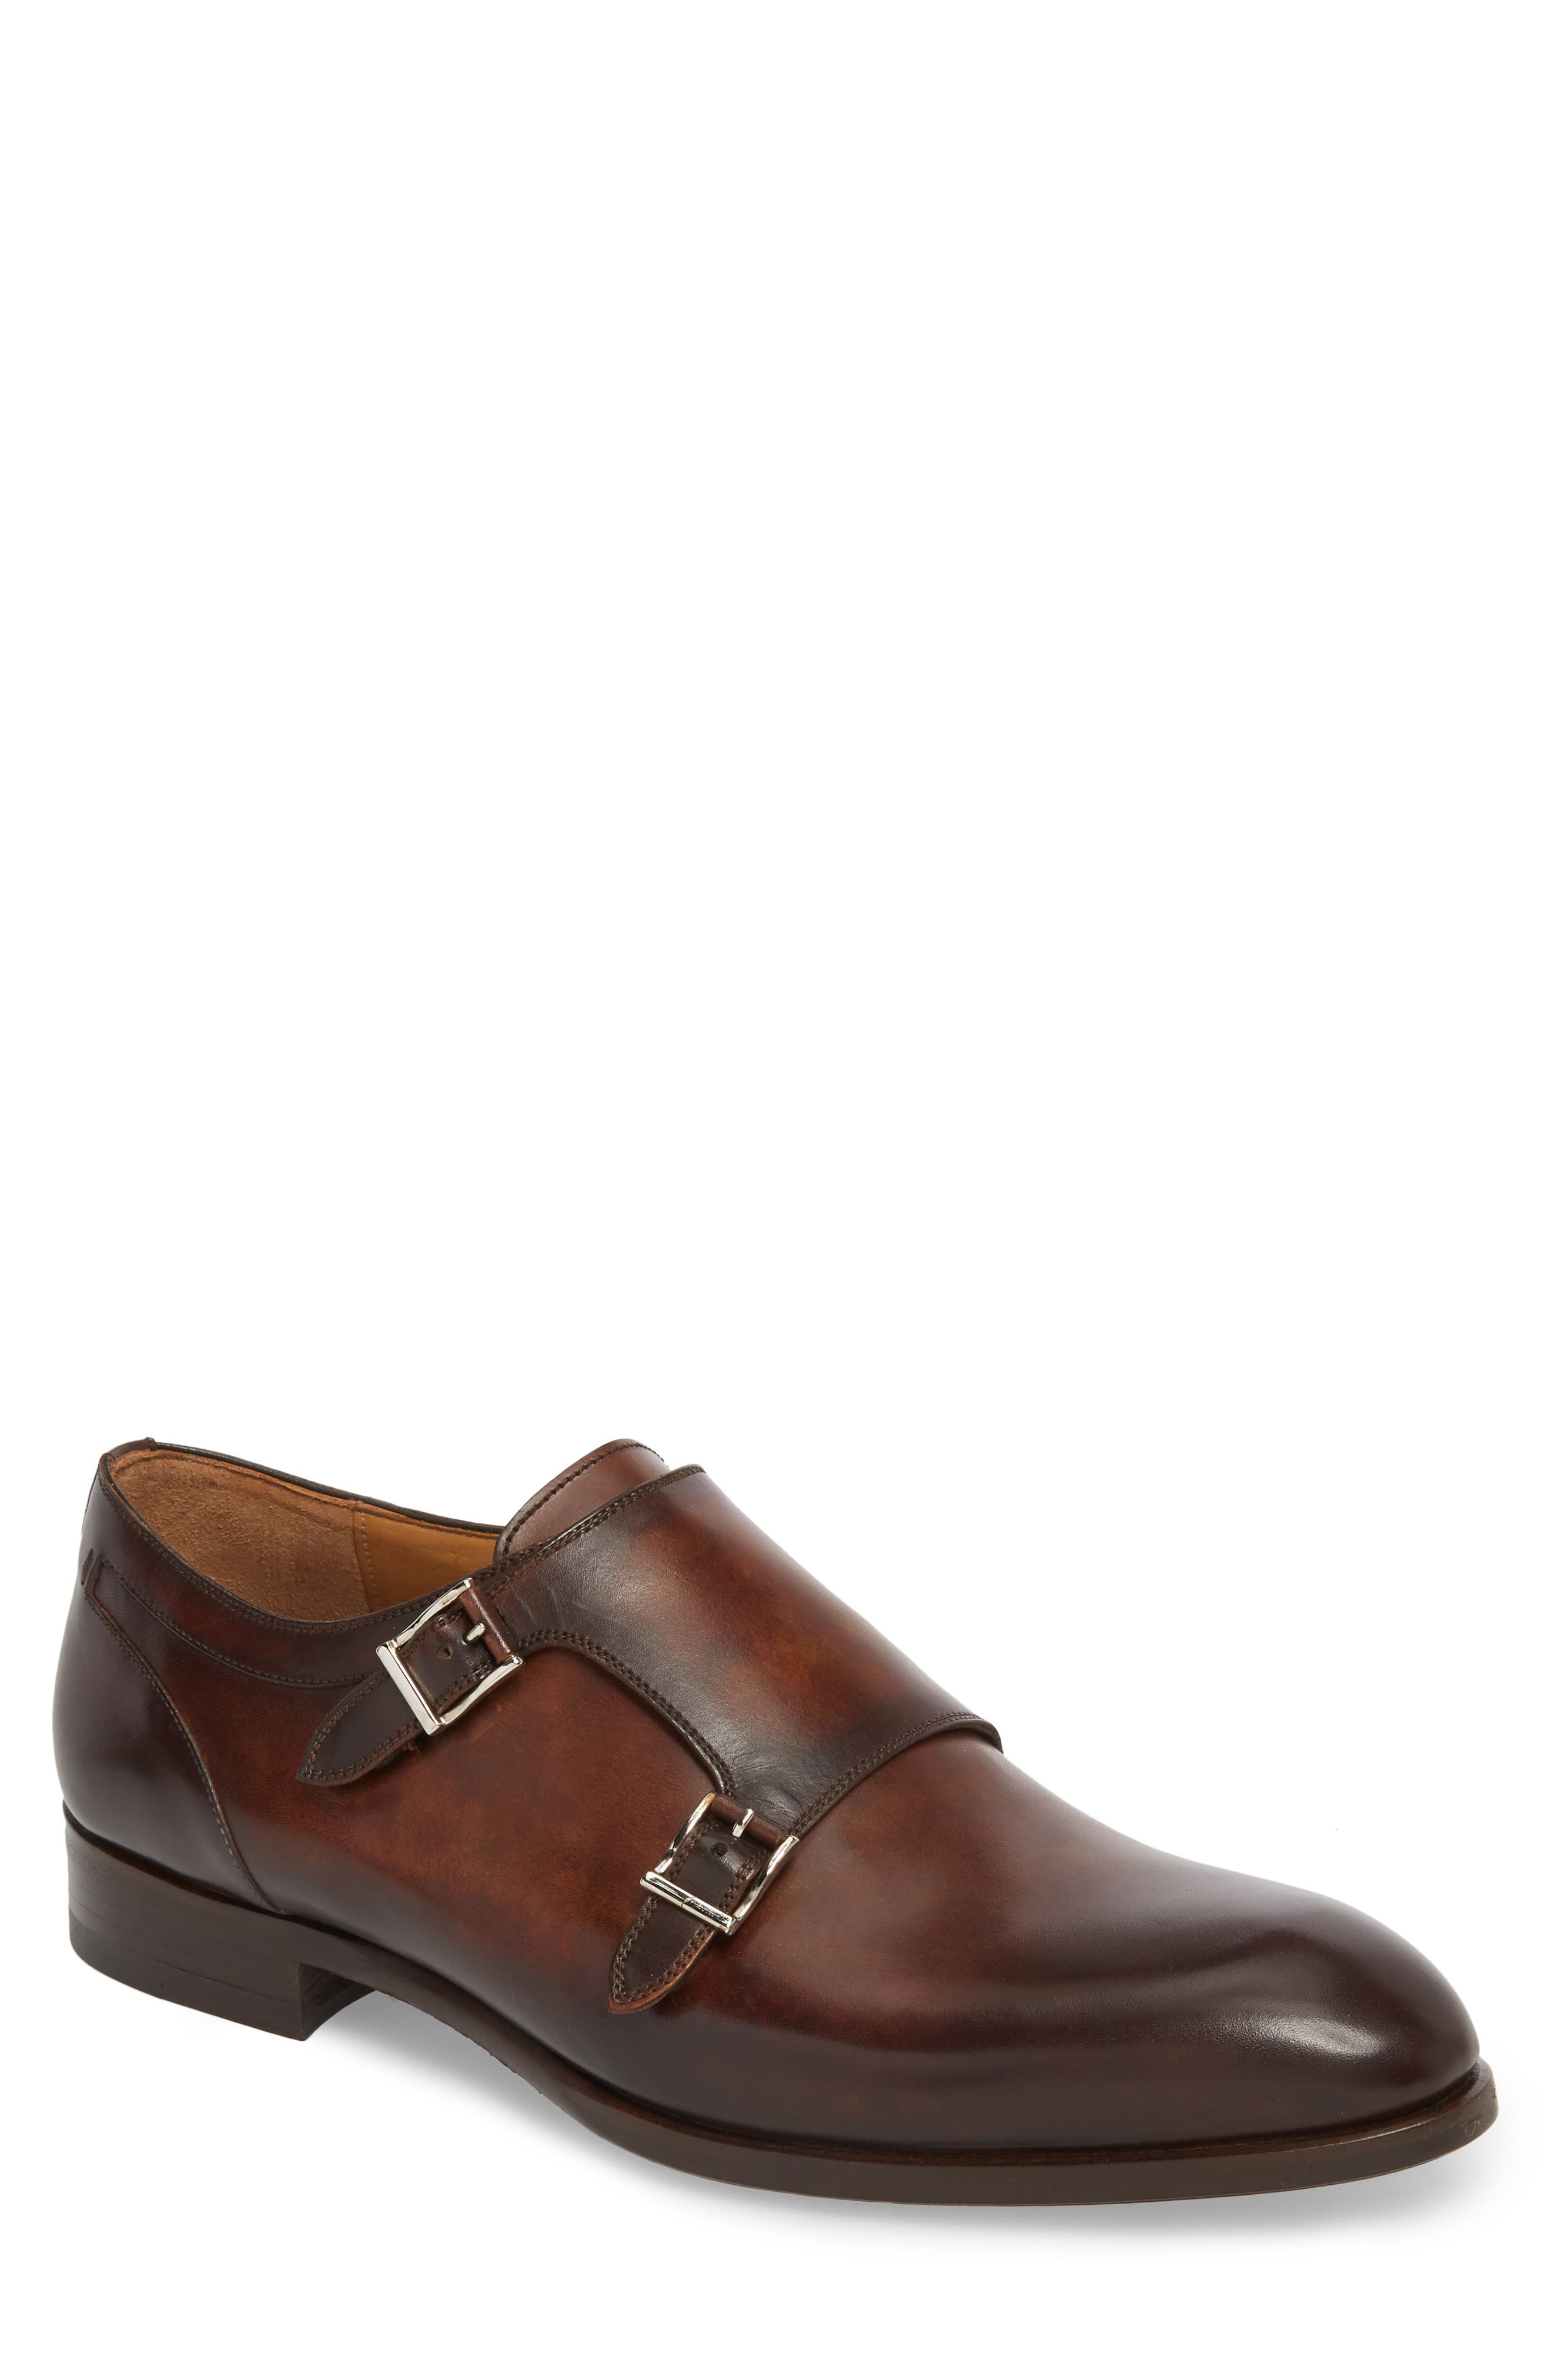 Pratt Double Strap Monk Shoe,                             Main thumbnail 1, color,                             Tabaco Leather